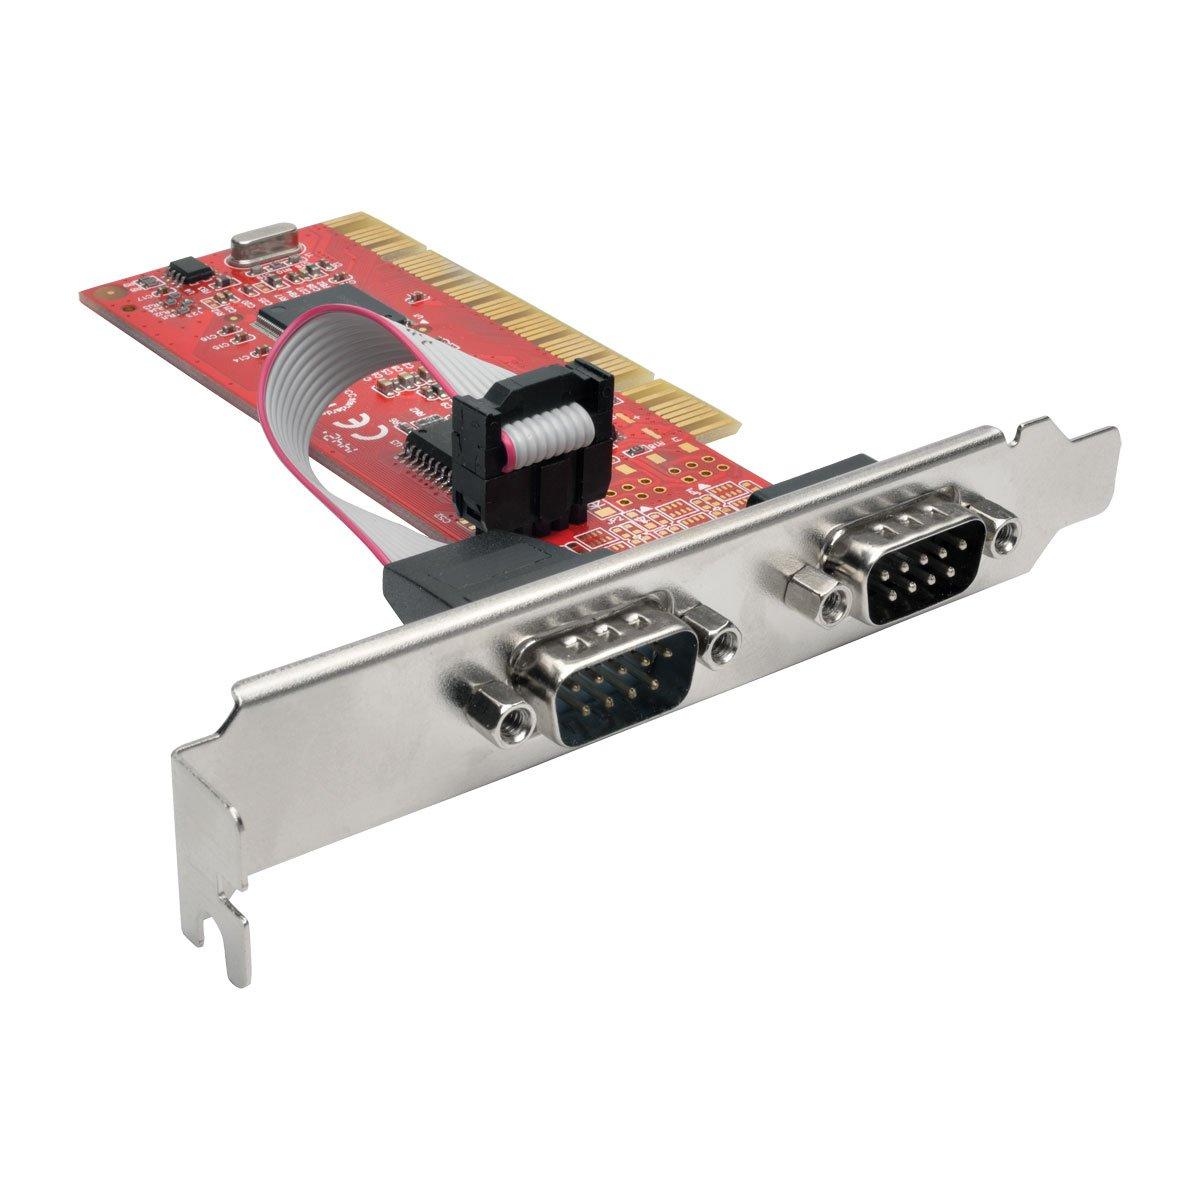 PCE-1G-01-LP Tripp Lite 1-Port Gigabit Ethernet Card GbE PCI Express PCIe Low Profile